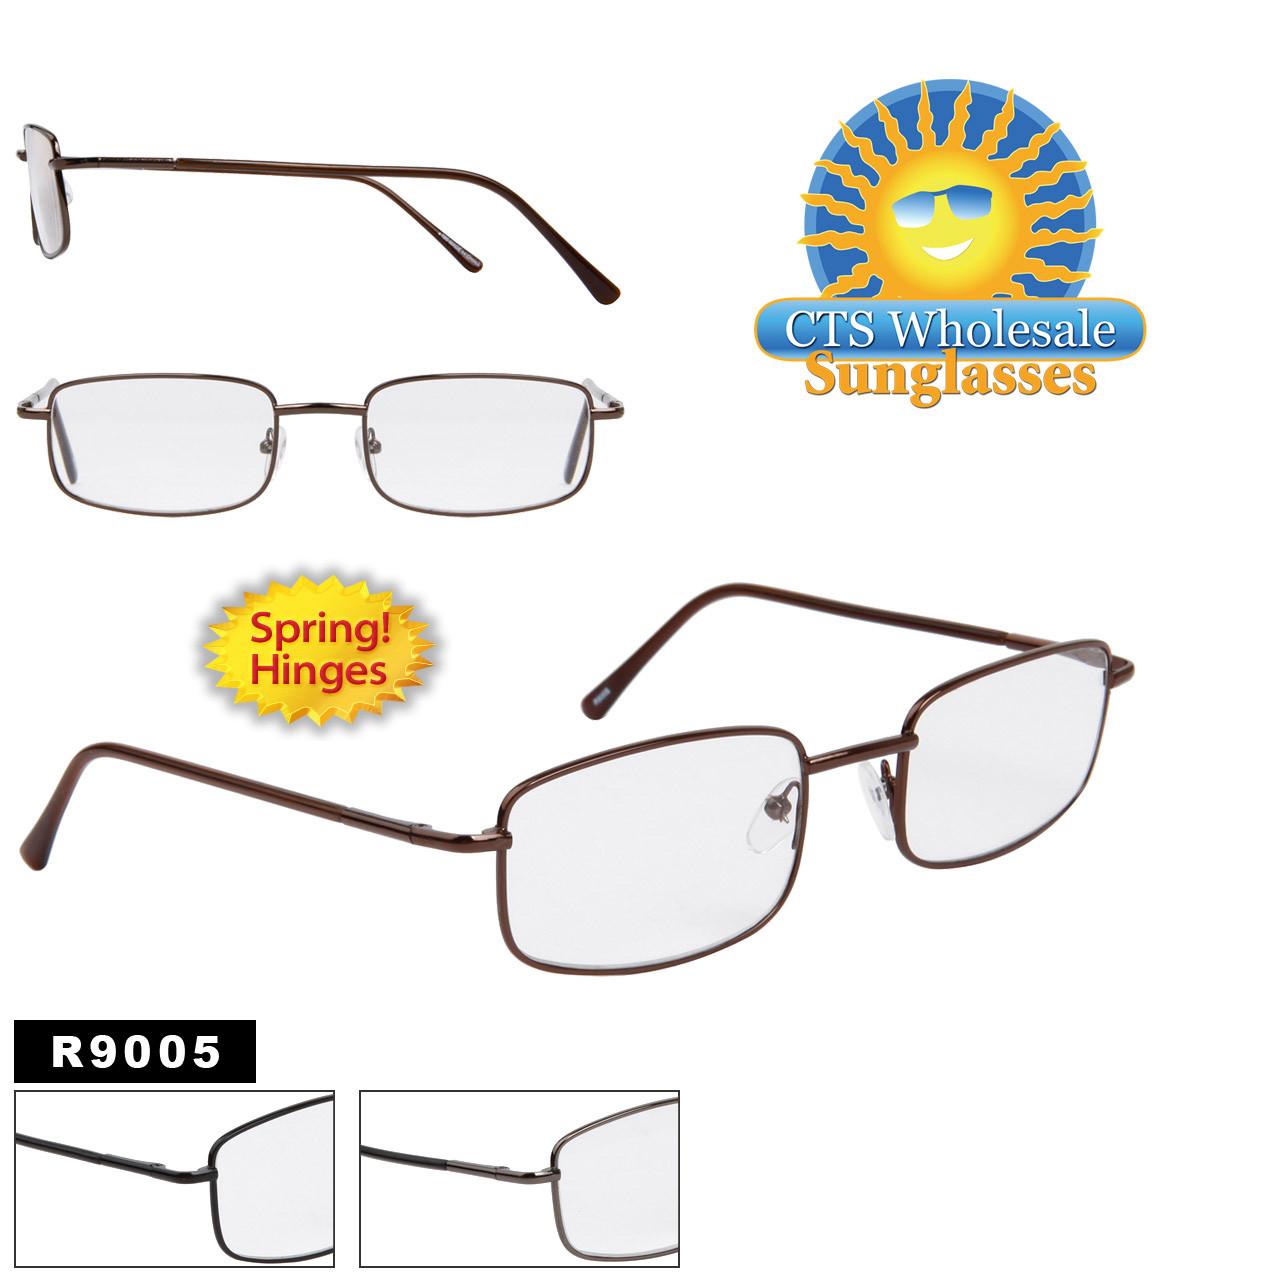 Wholesale Reading Glasses R9005